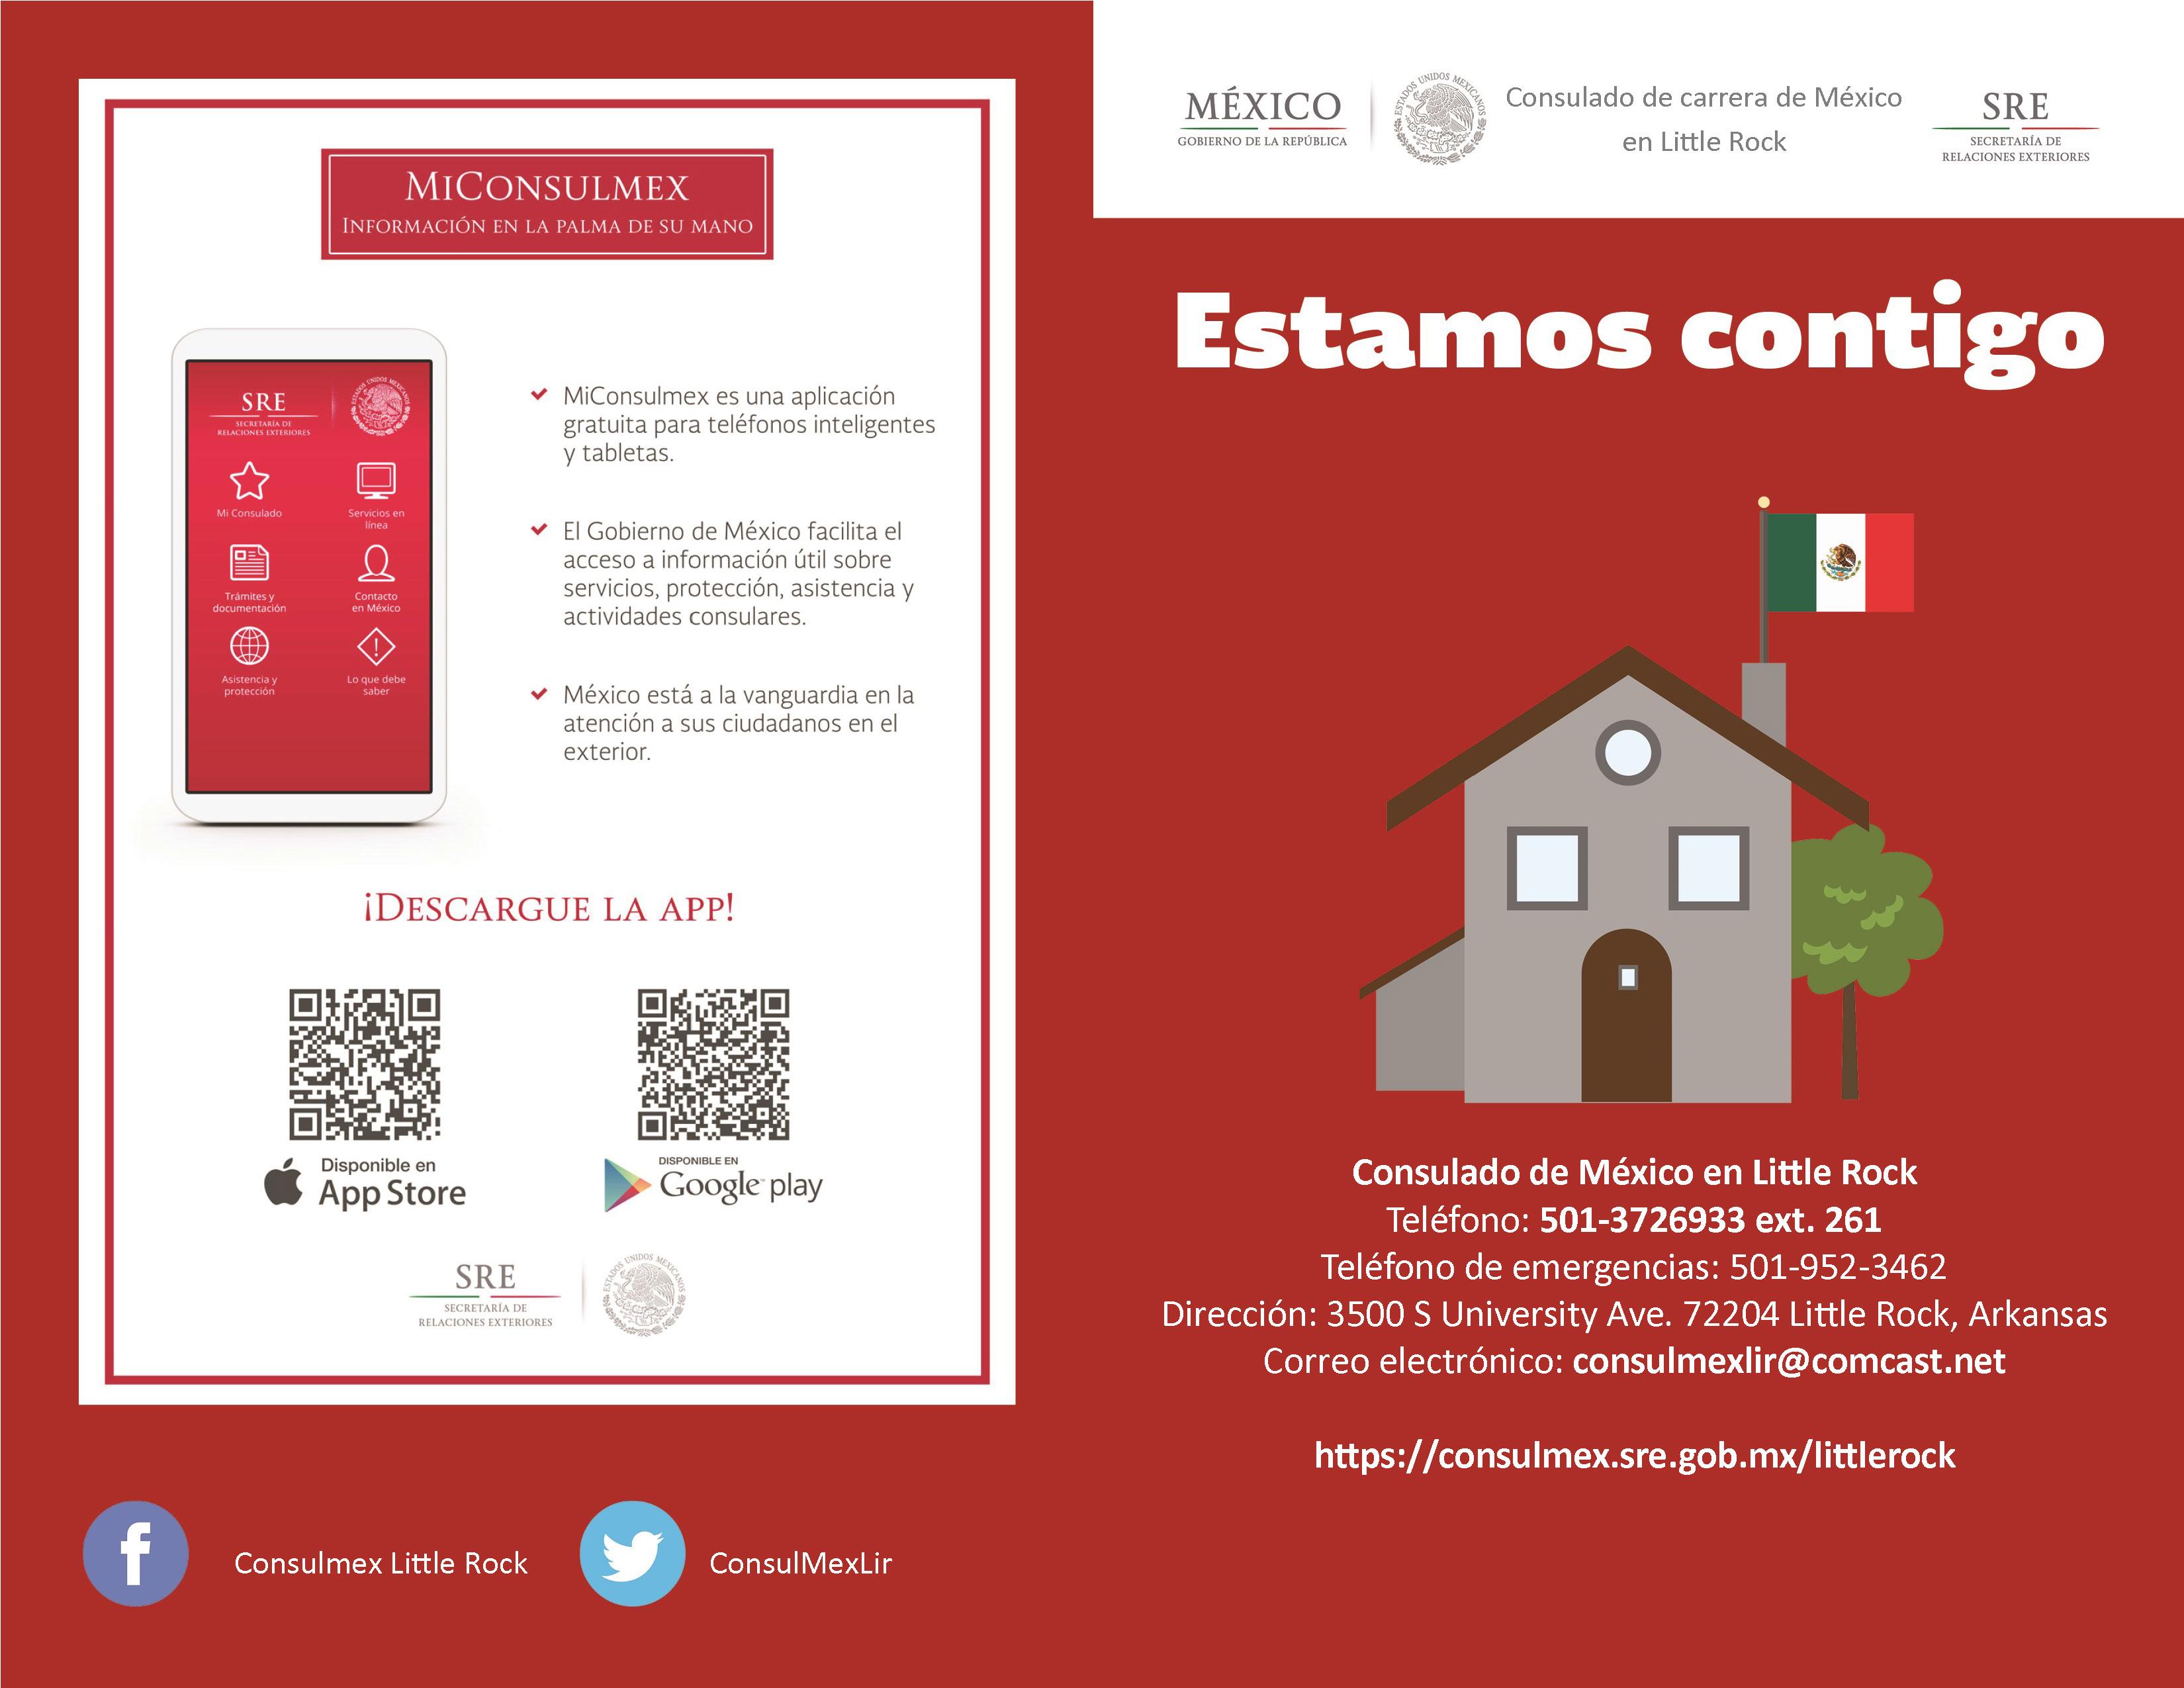 folleto_estamoscontigo__Page_1.jpg